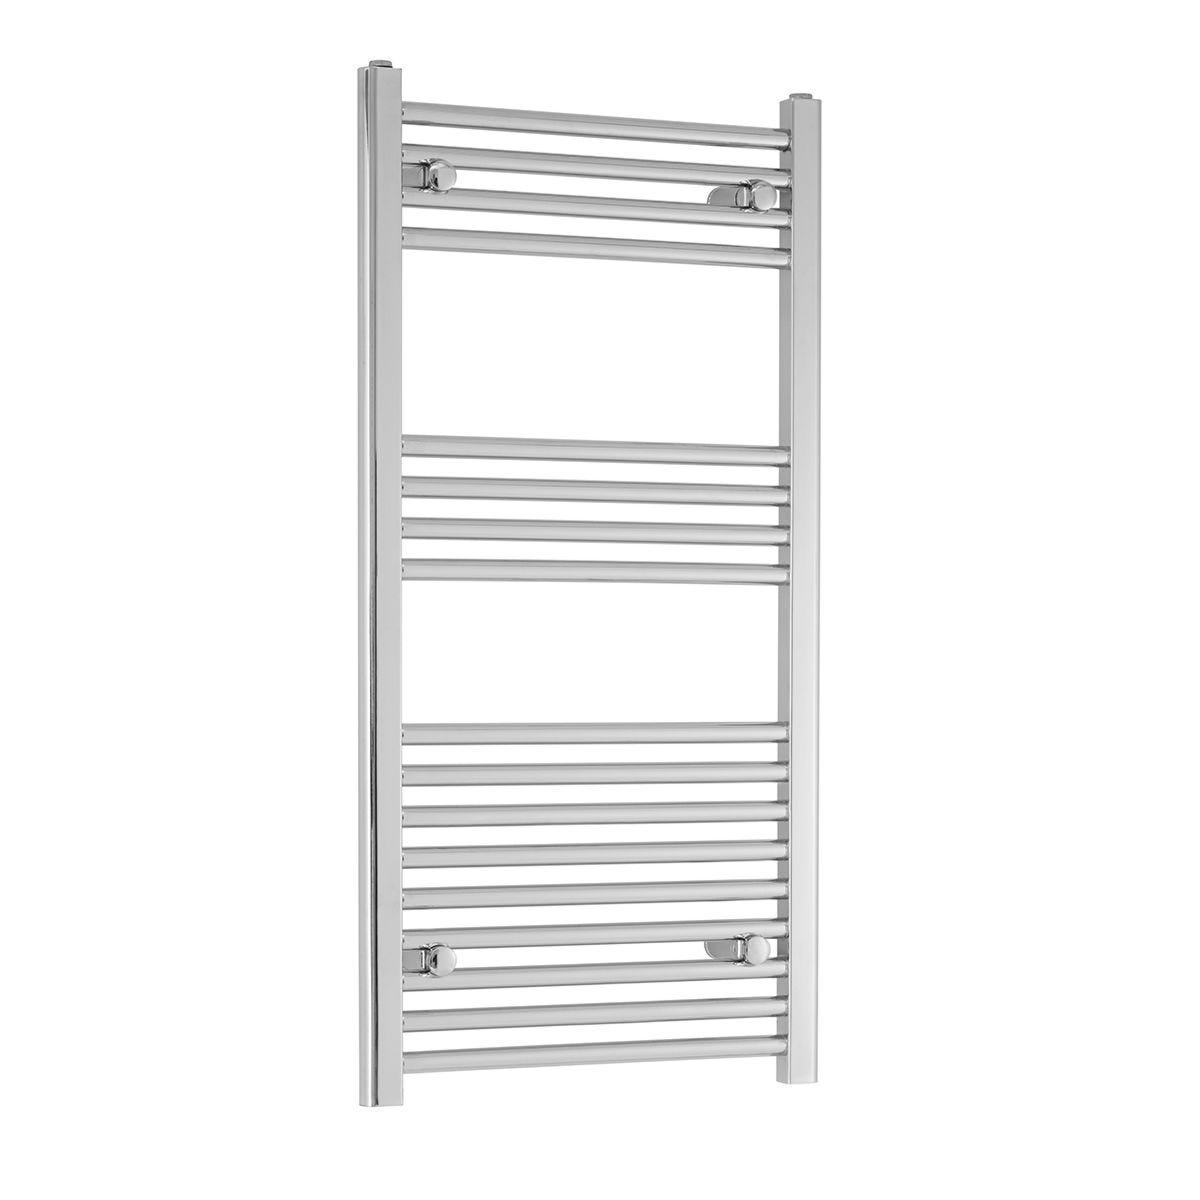 Heating Style Blythe Ladder Rail 1200x600mm Straight - Chrome